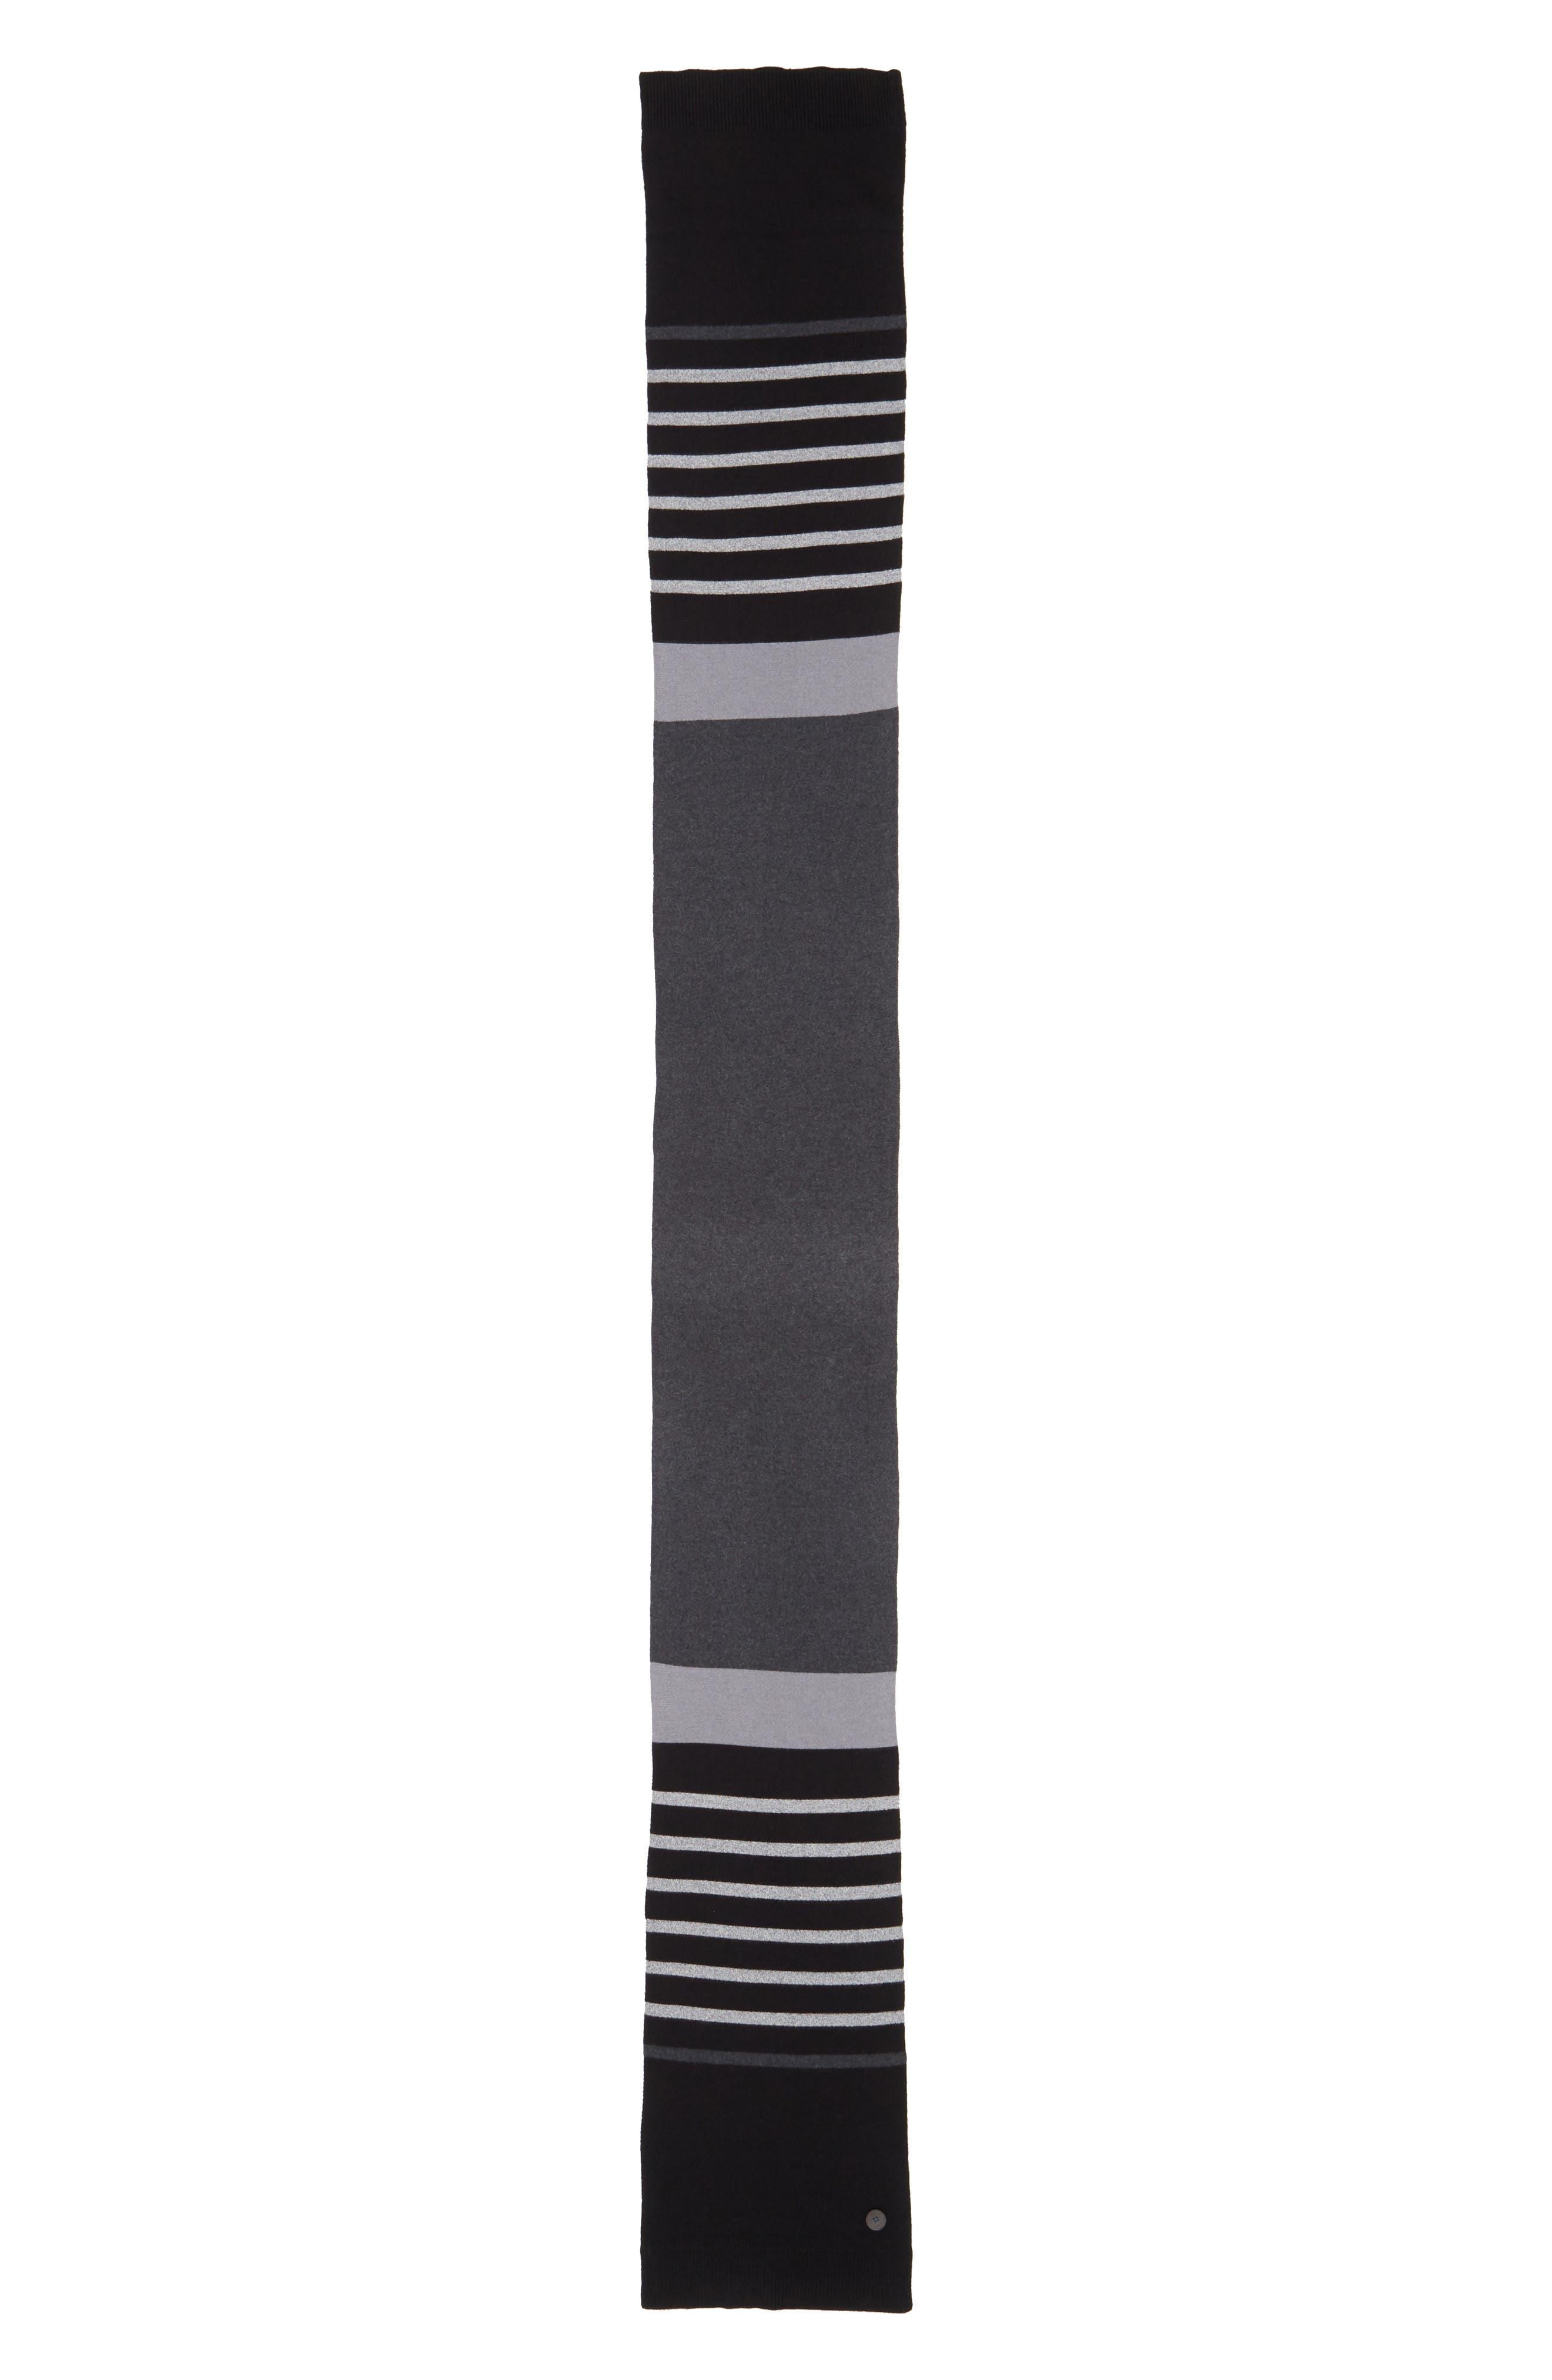 TED BAKER LONDON, Stripe Scarf, Alternate thumbnail 2, color, 001